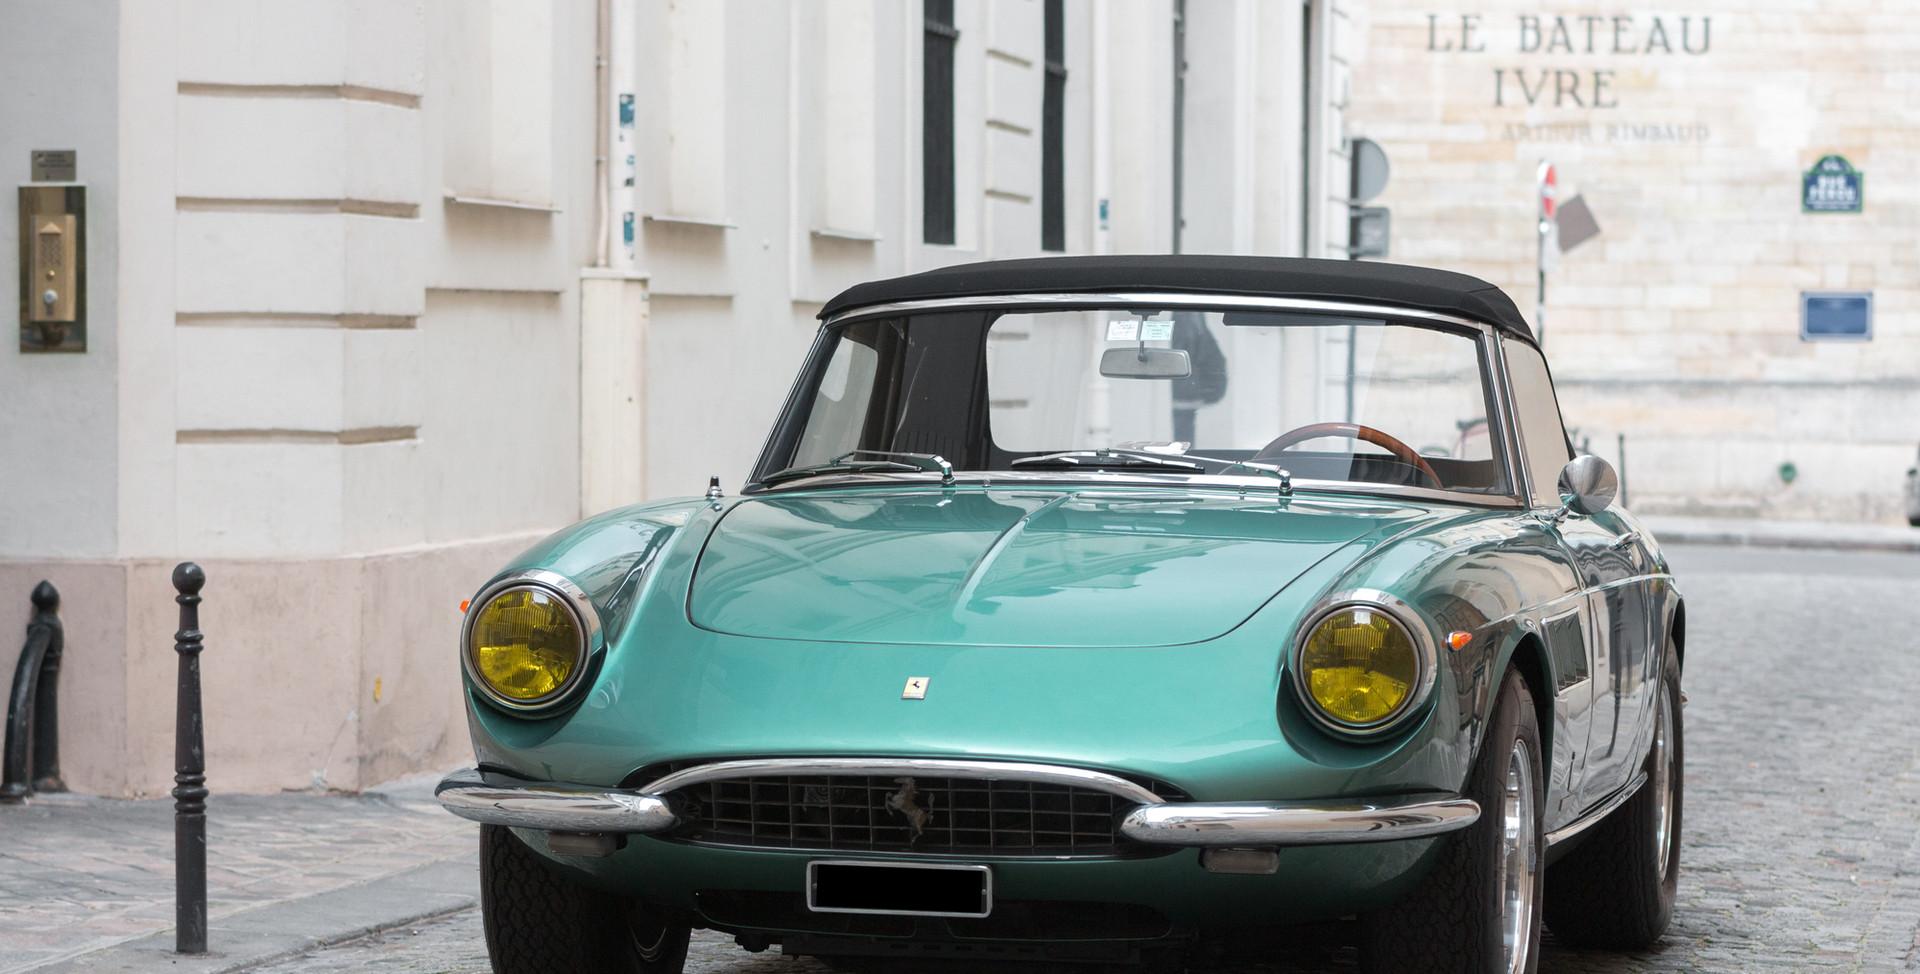 Ferrari_275_GTS_extérieur_(6).jpg.jpg